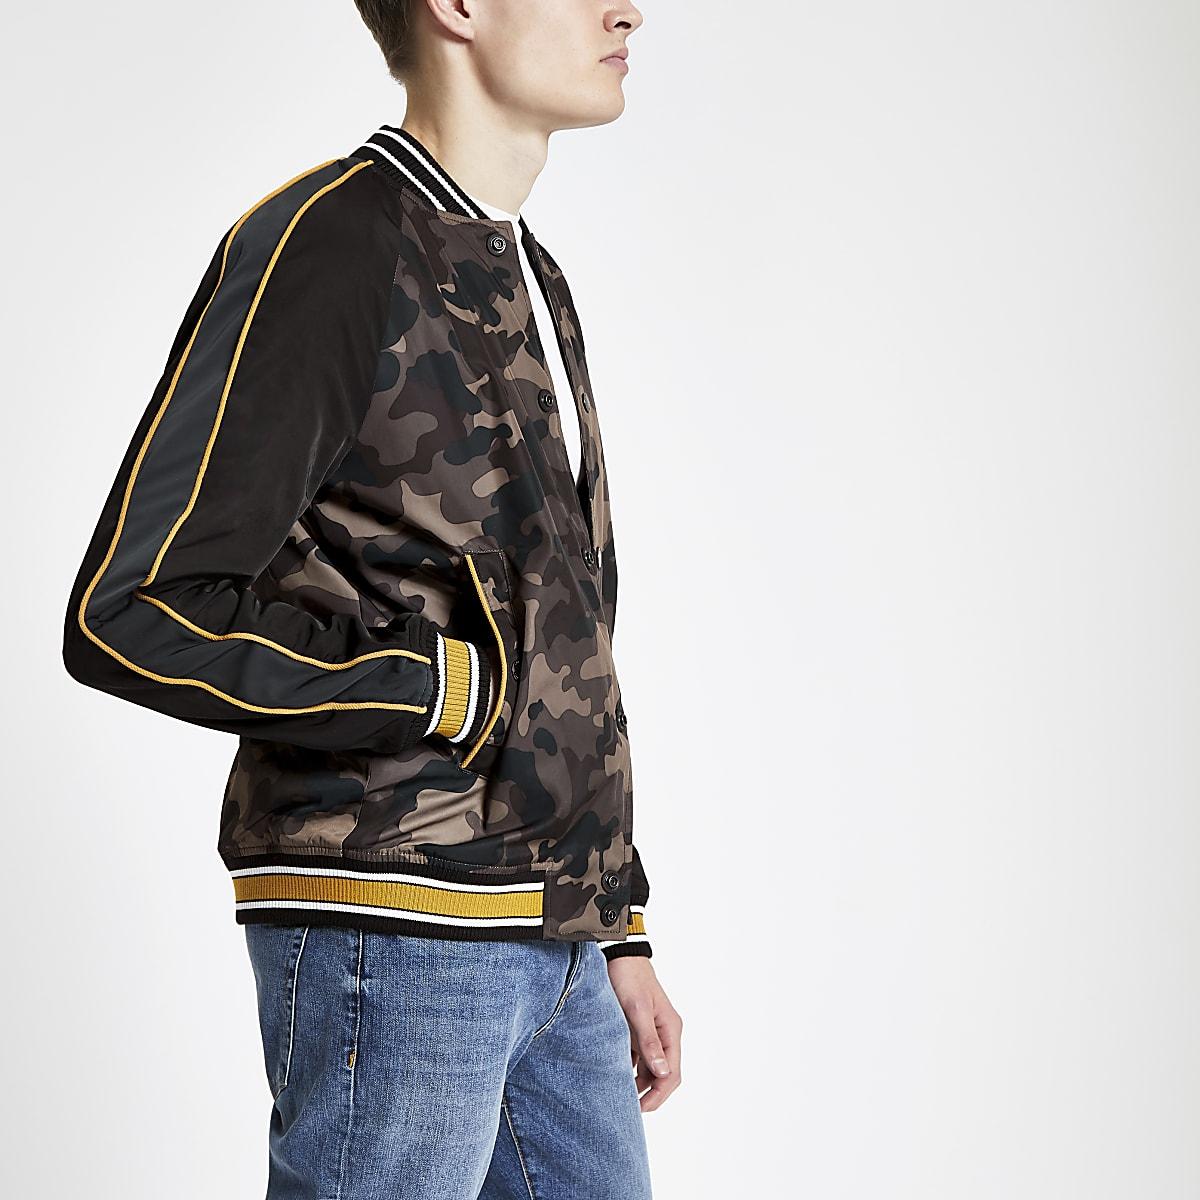 Superdry – Veste de baseball motif camouflage marron